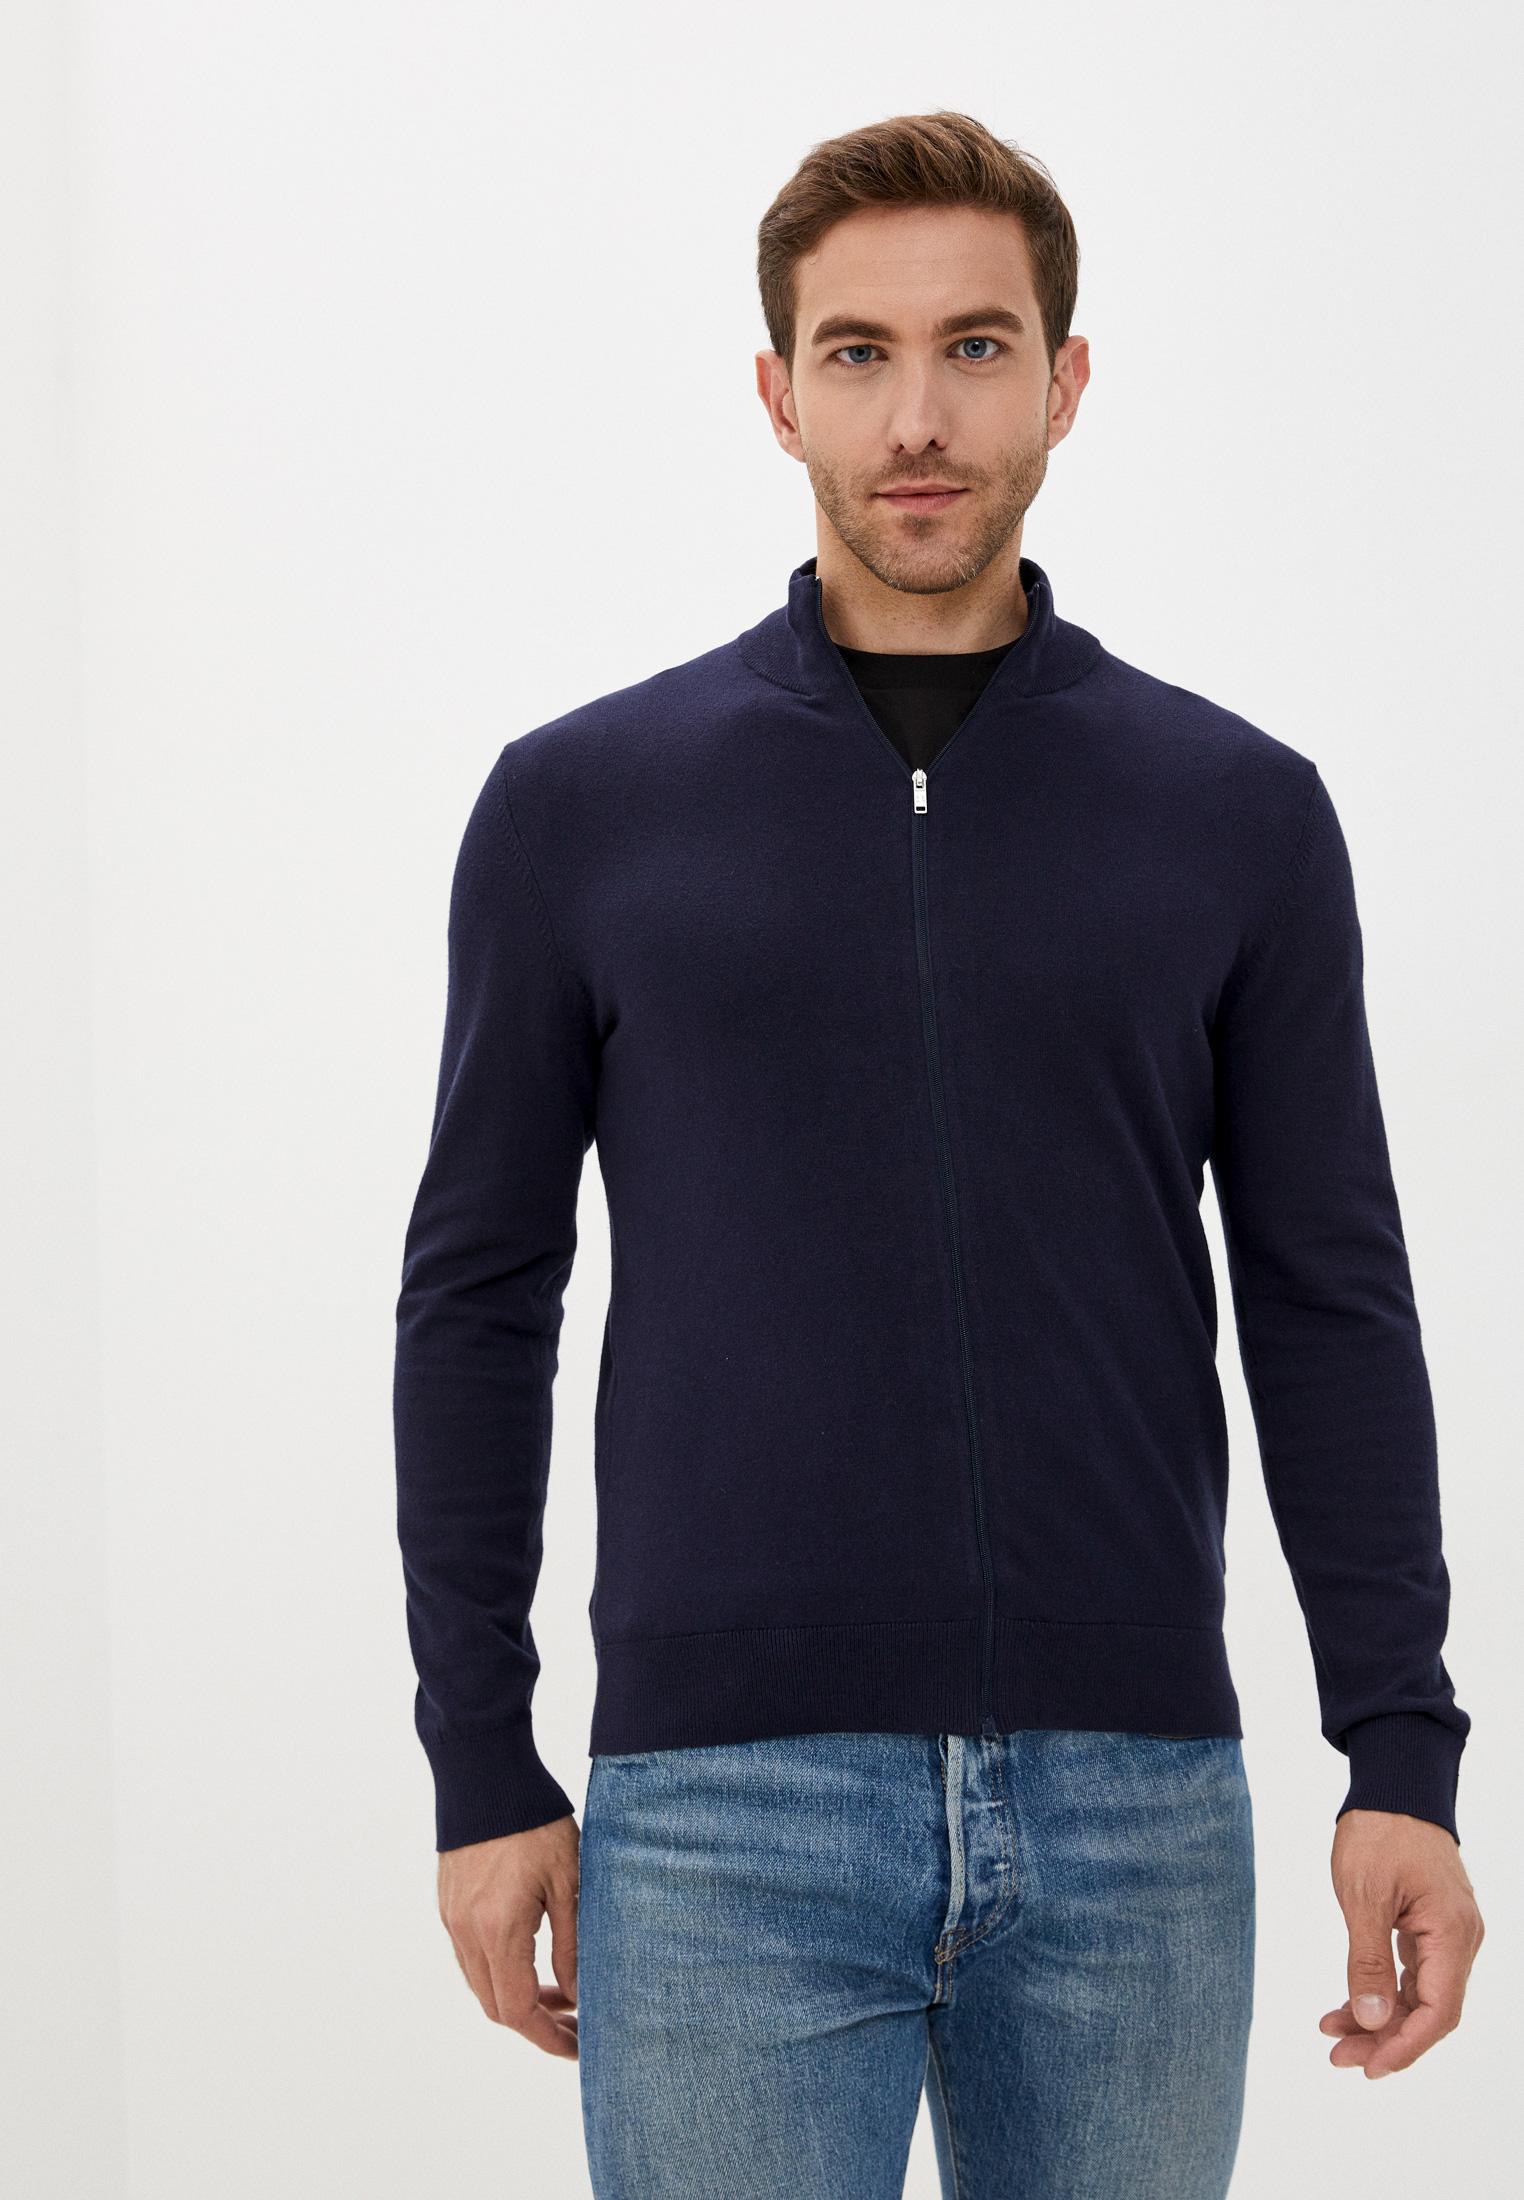 Кардиган Burton Menswear London 27C21RNVY